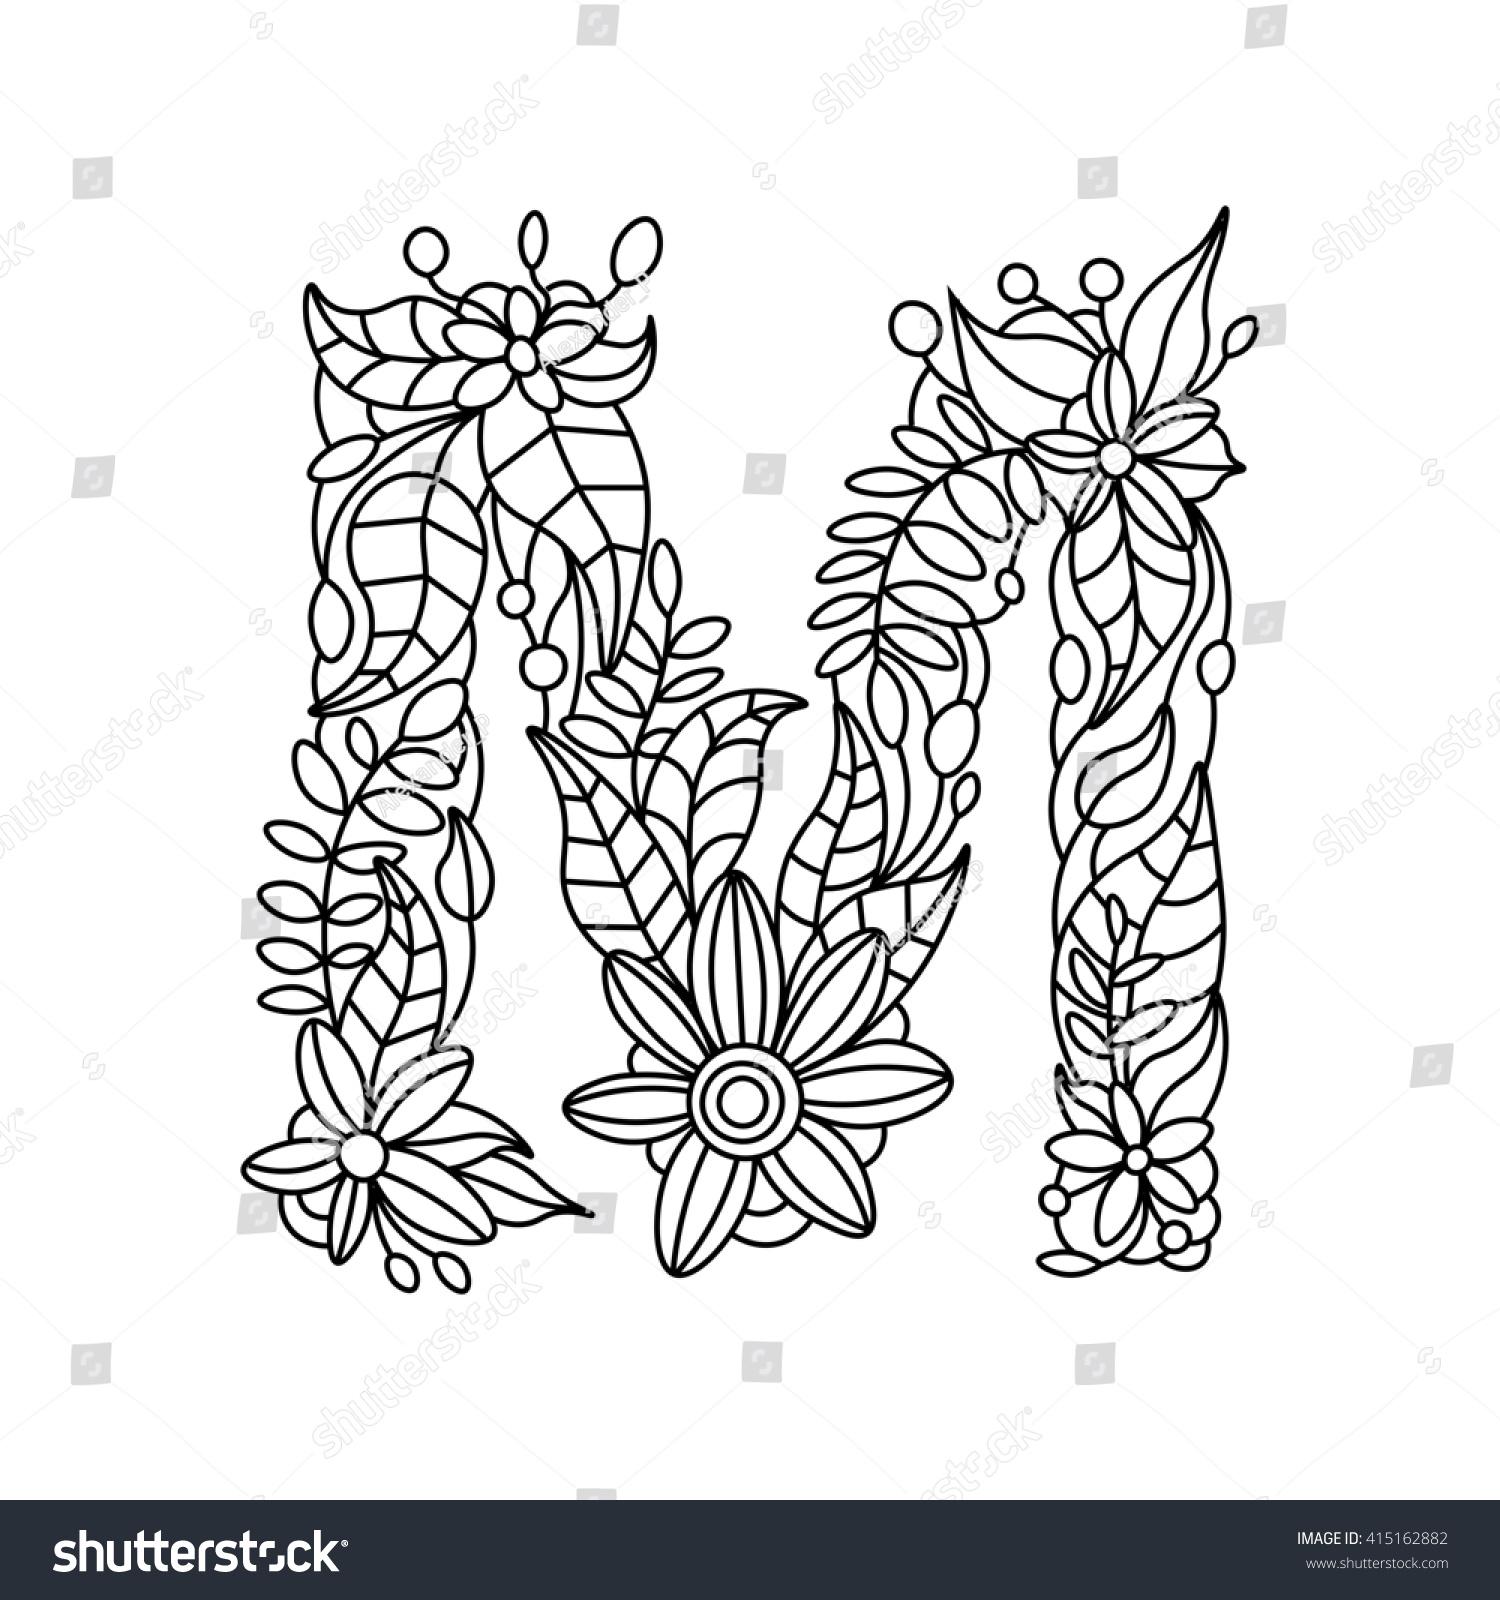 Floral Alphabet Letter Coloring Book For Adults Raster Illustration 415162882